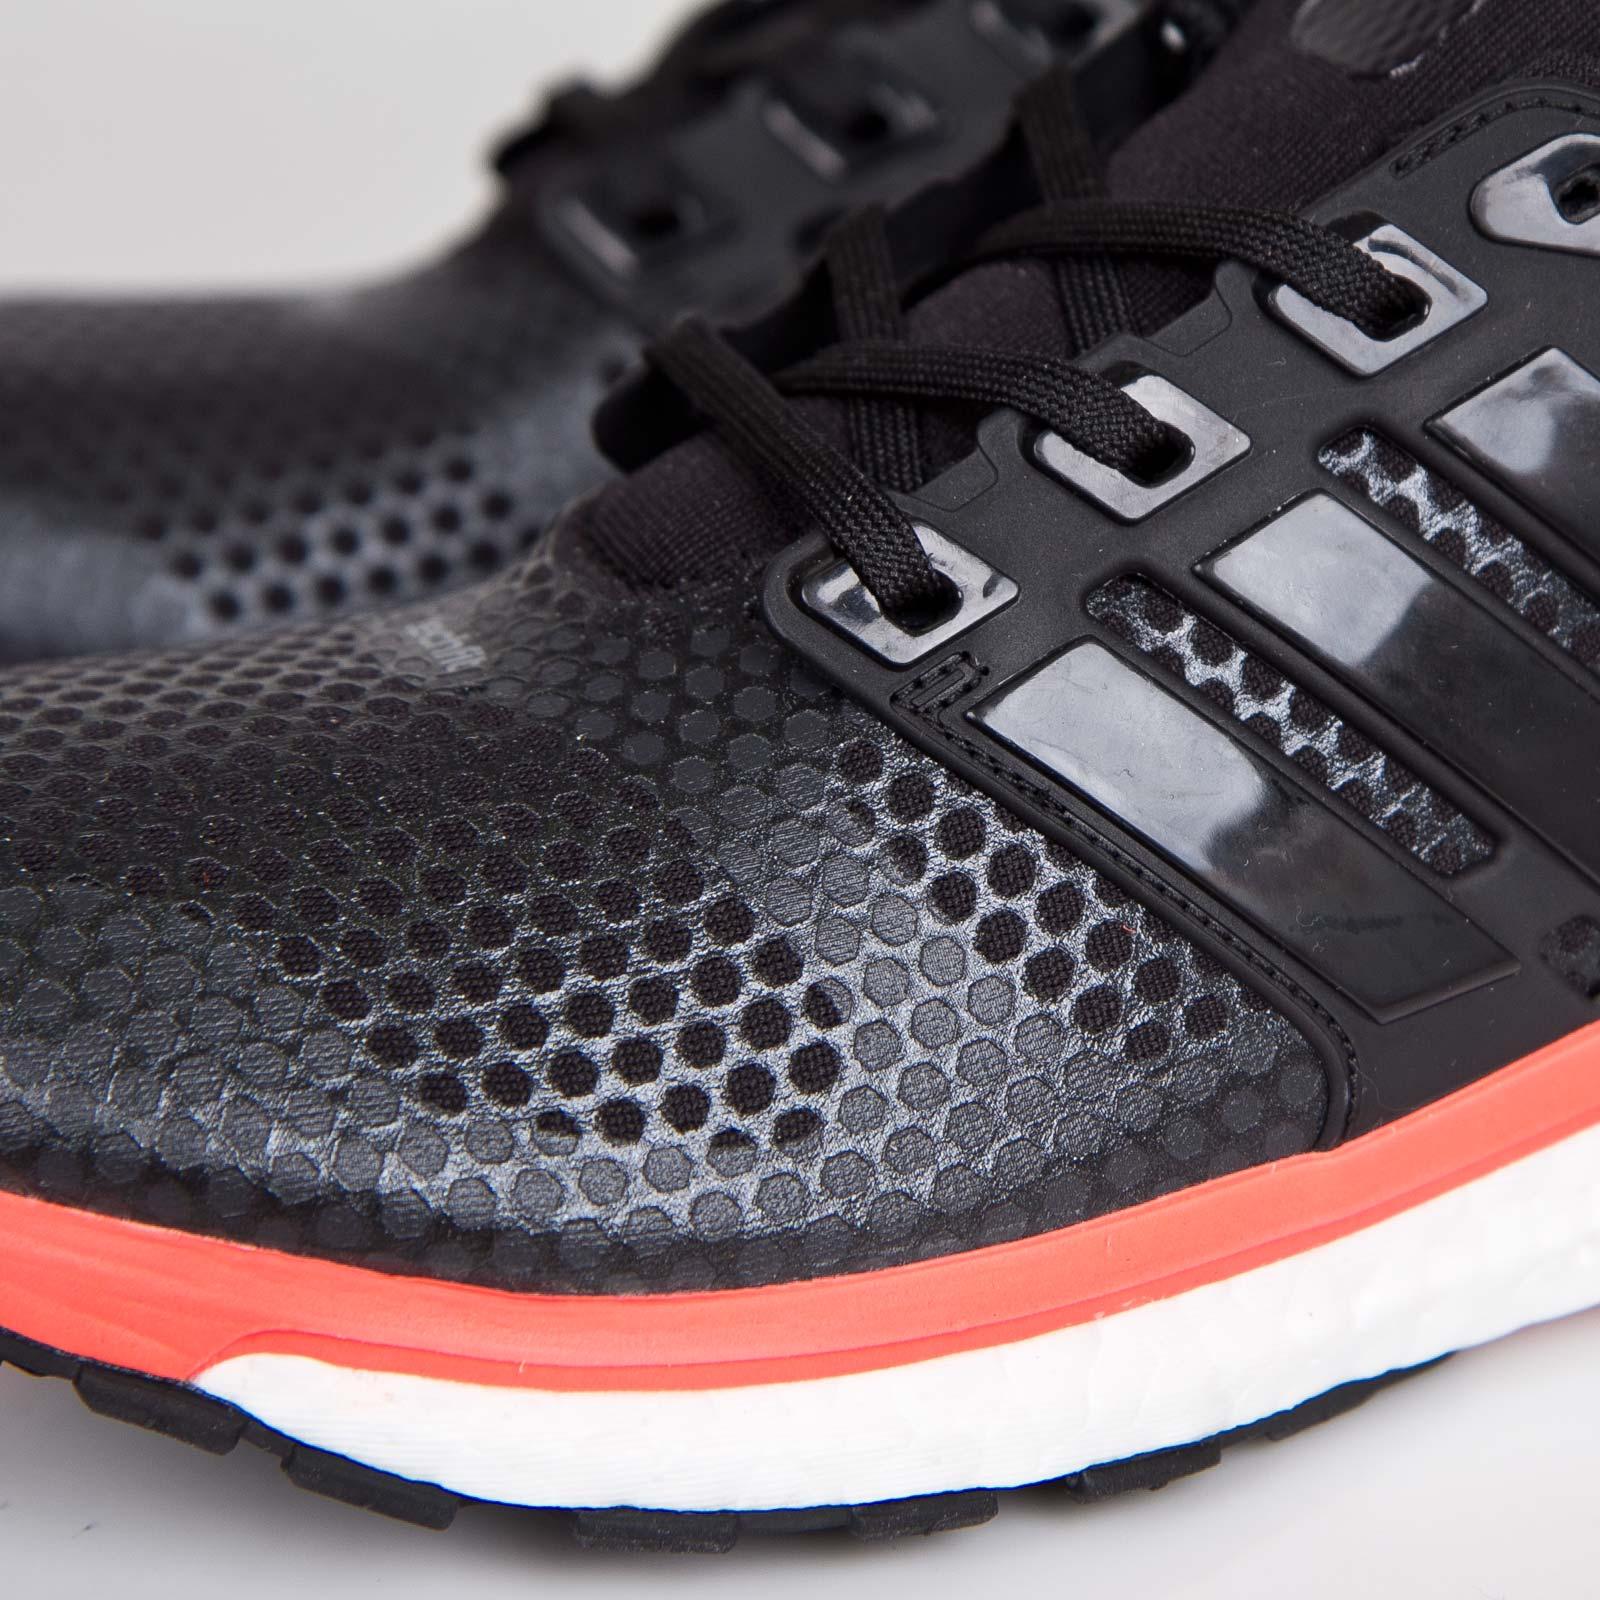 online retailer 6d3c8 348d2 ... adidas energy boost 2 ATR m ...